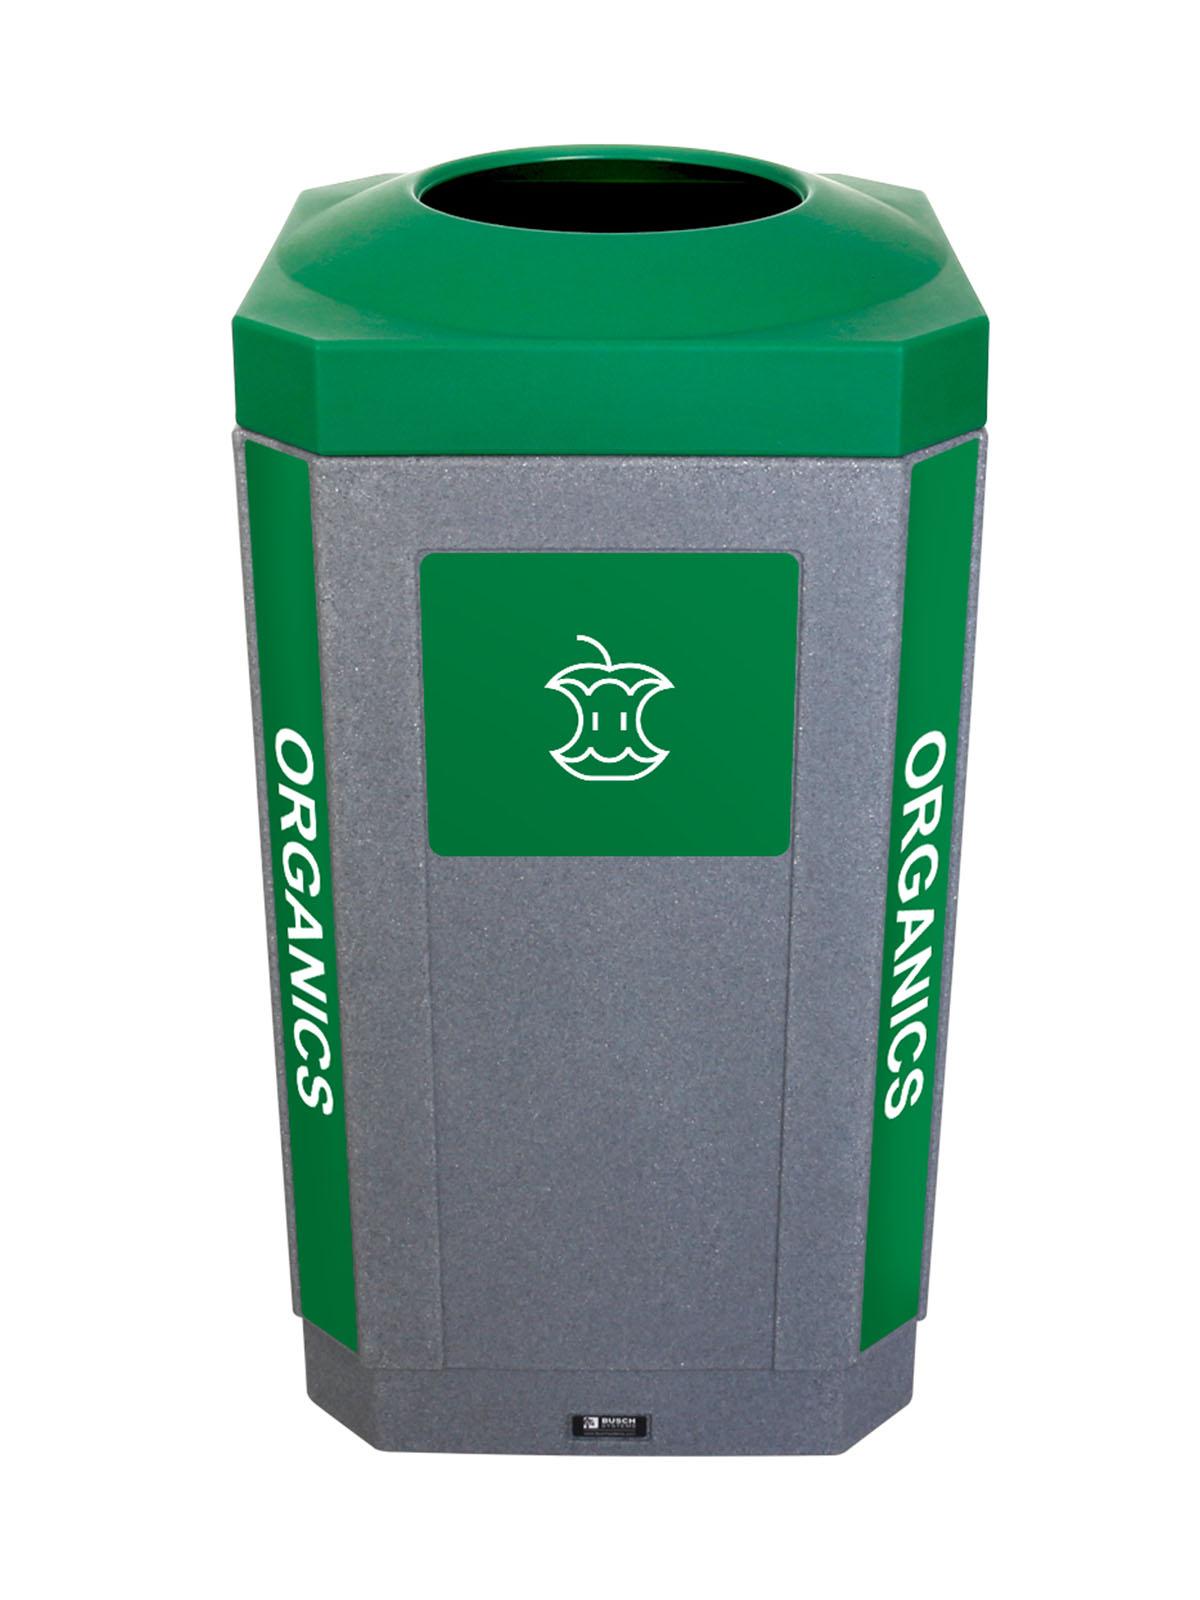 OCTO - Single - Indoor - Organics  - Full - Greystone-Green